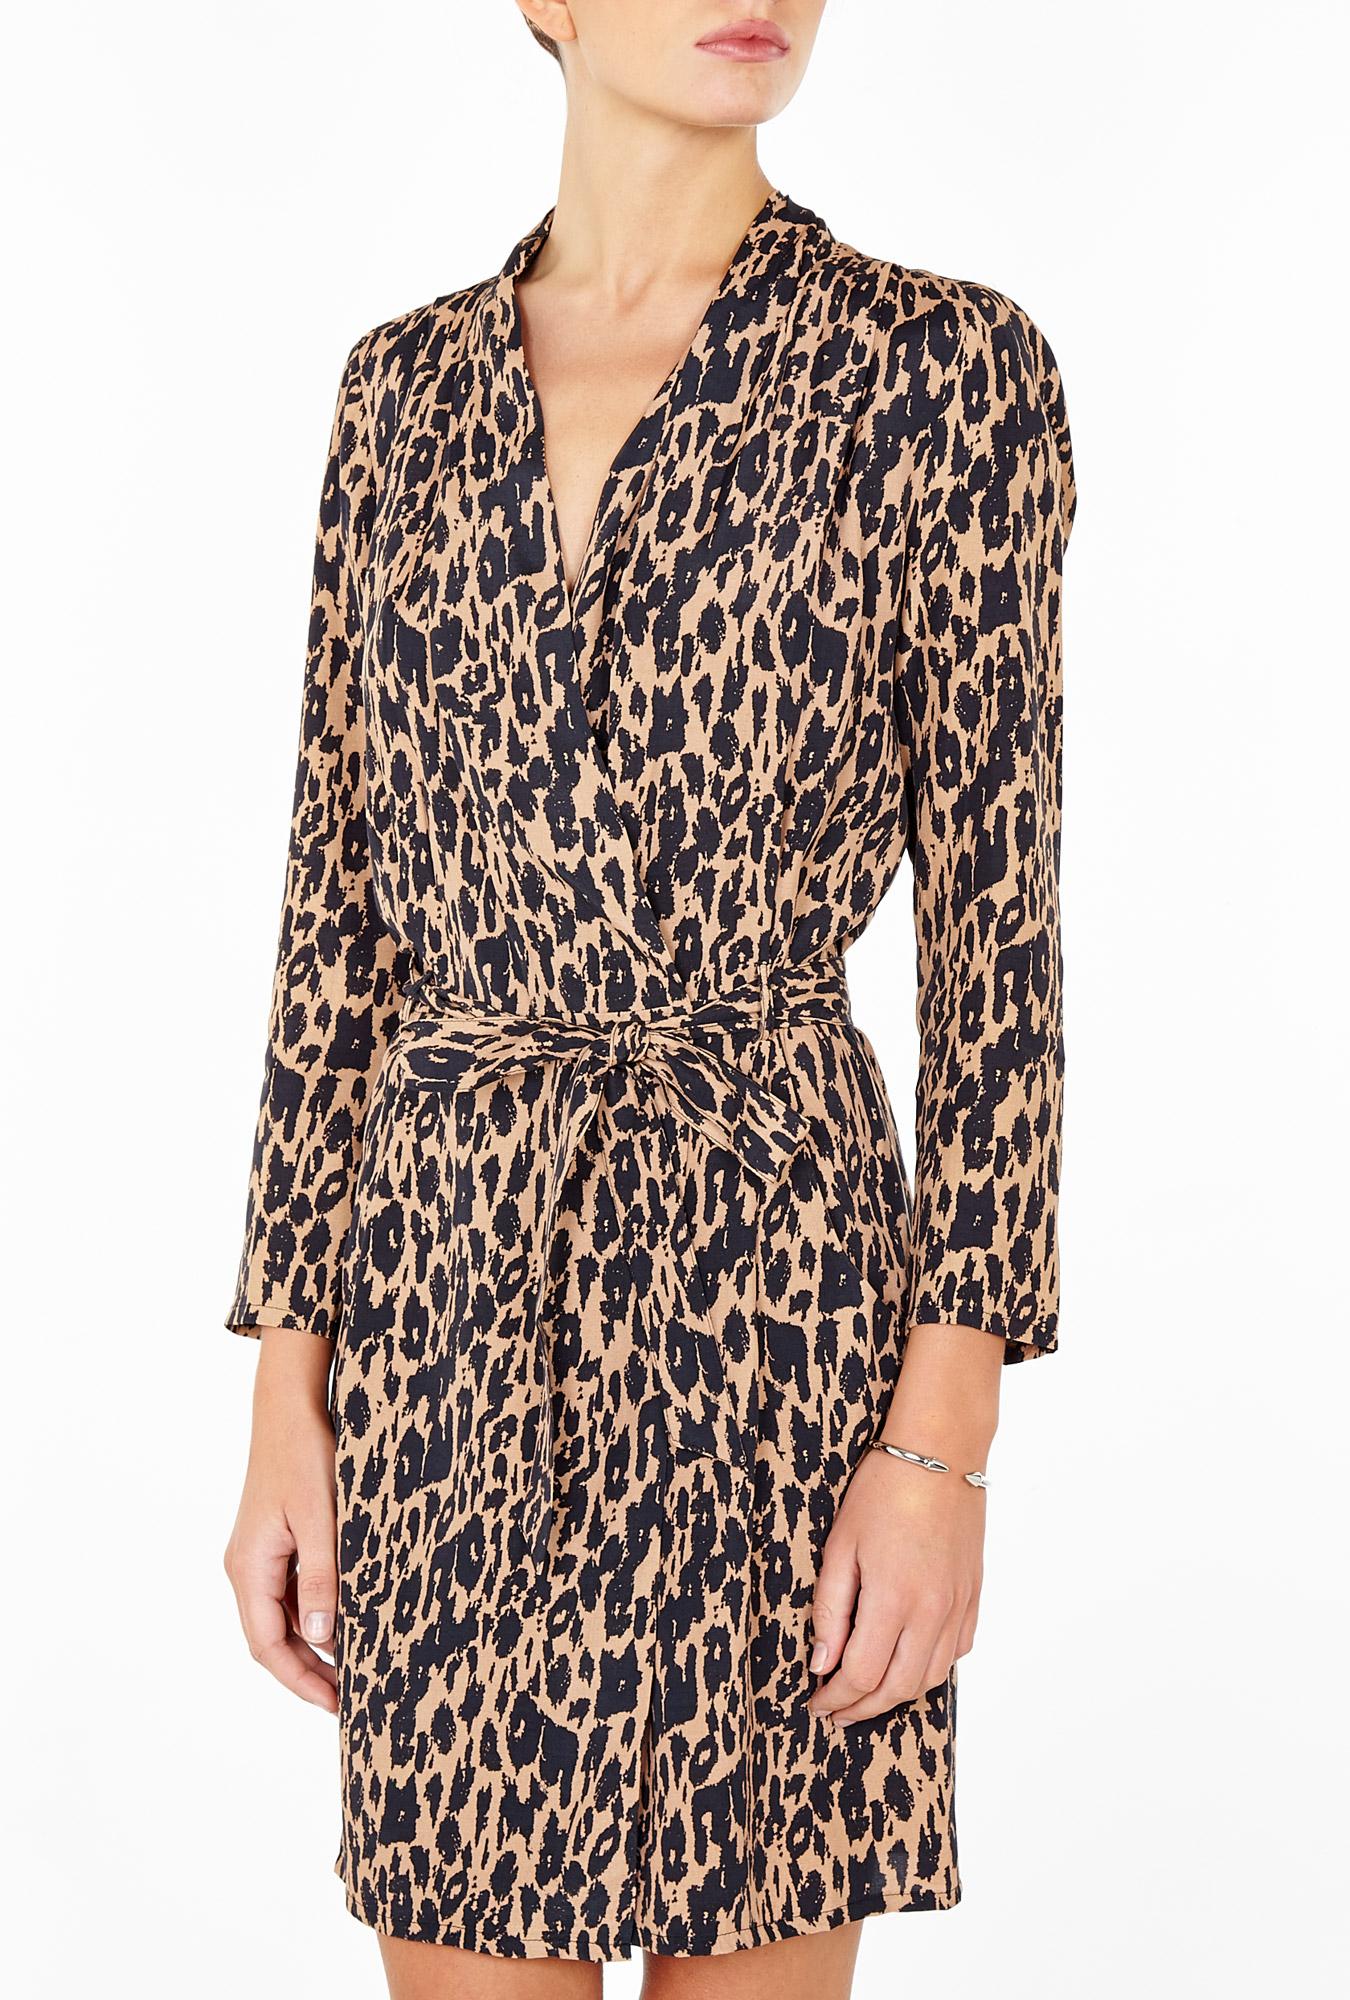 Ganni Leopard wrap dress, was £125, Now £75